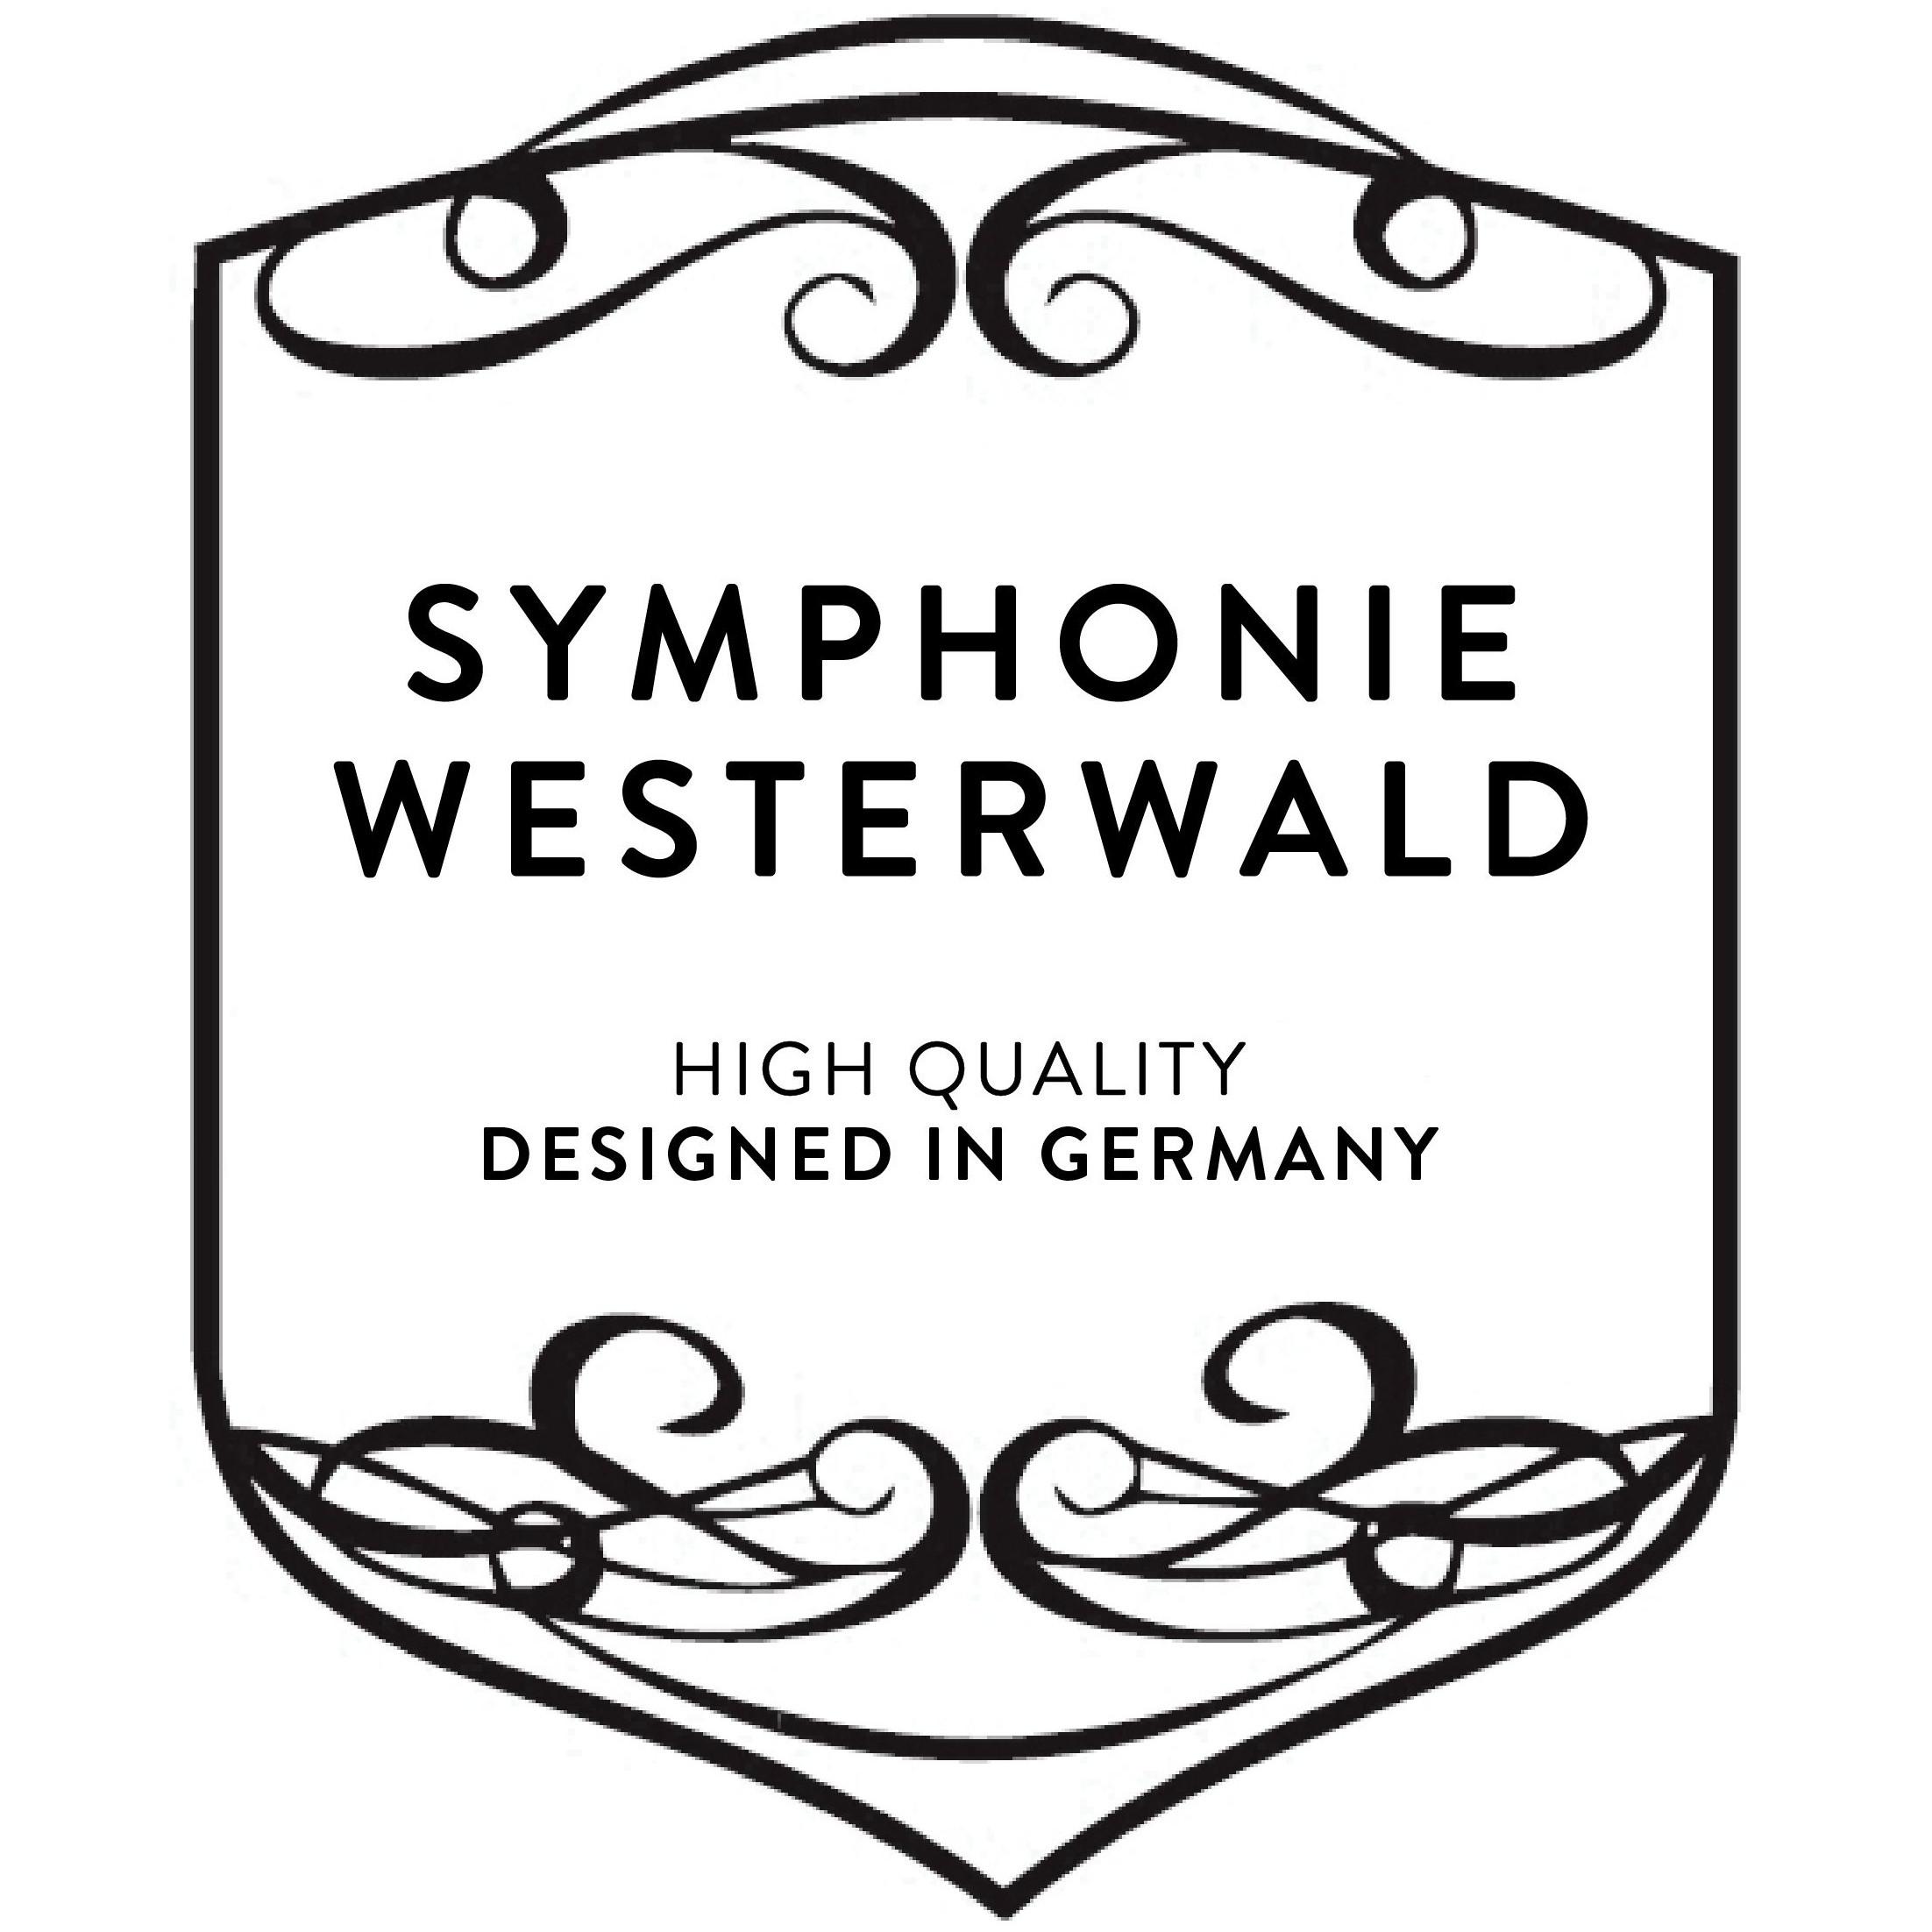 Symphonie Westerwald | Quality Designed in Germany